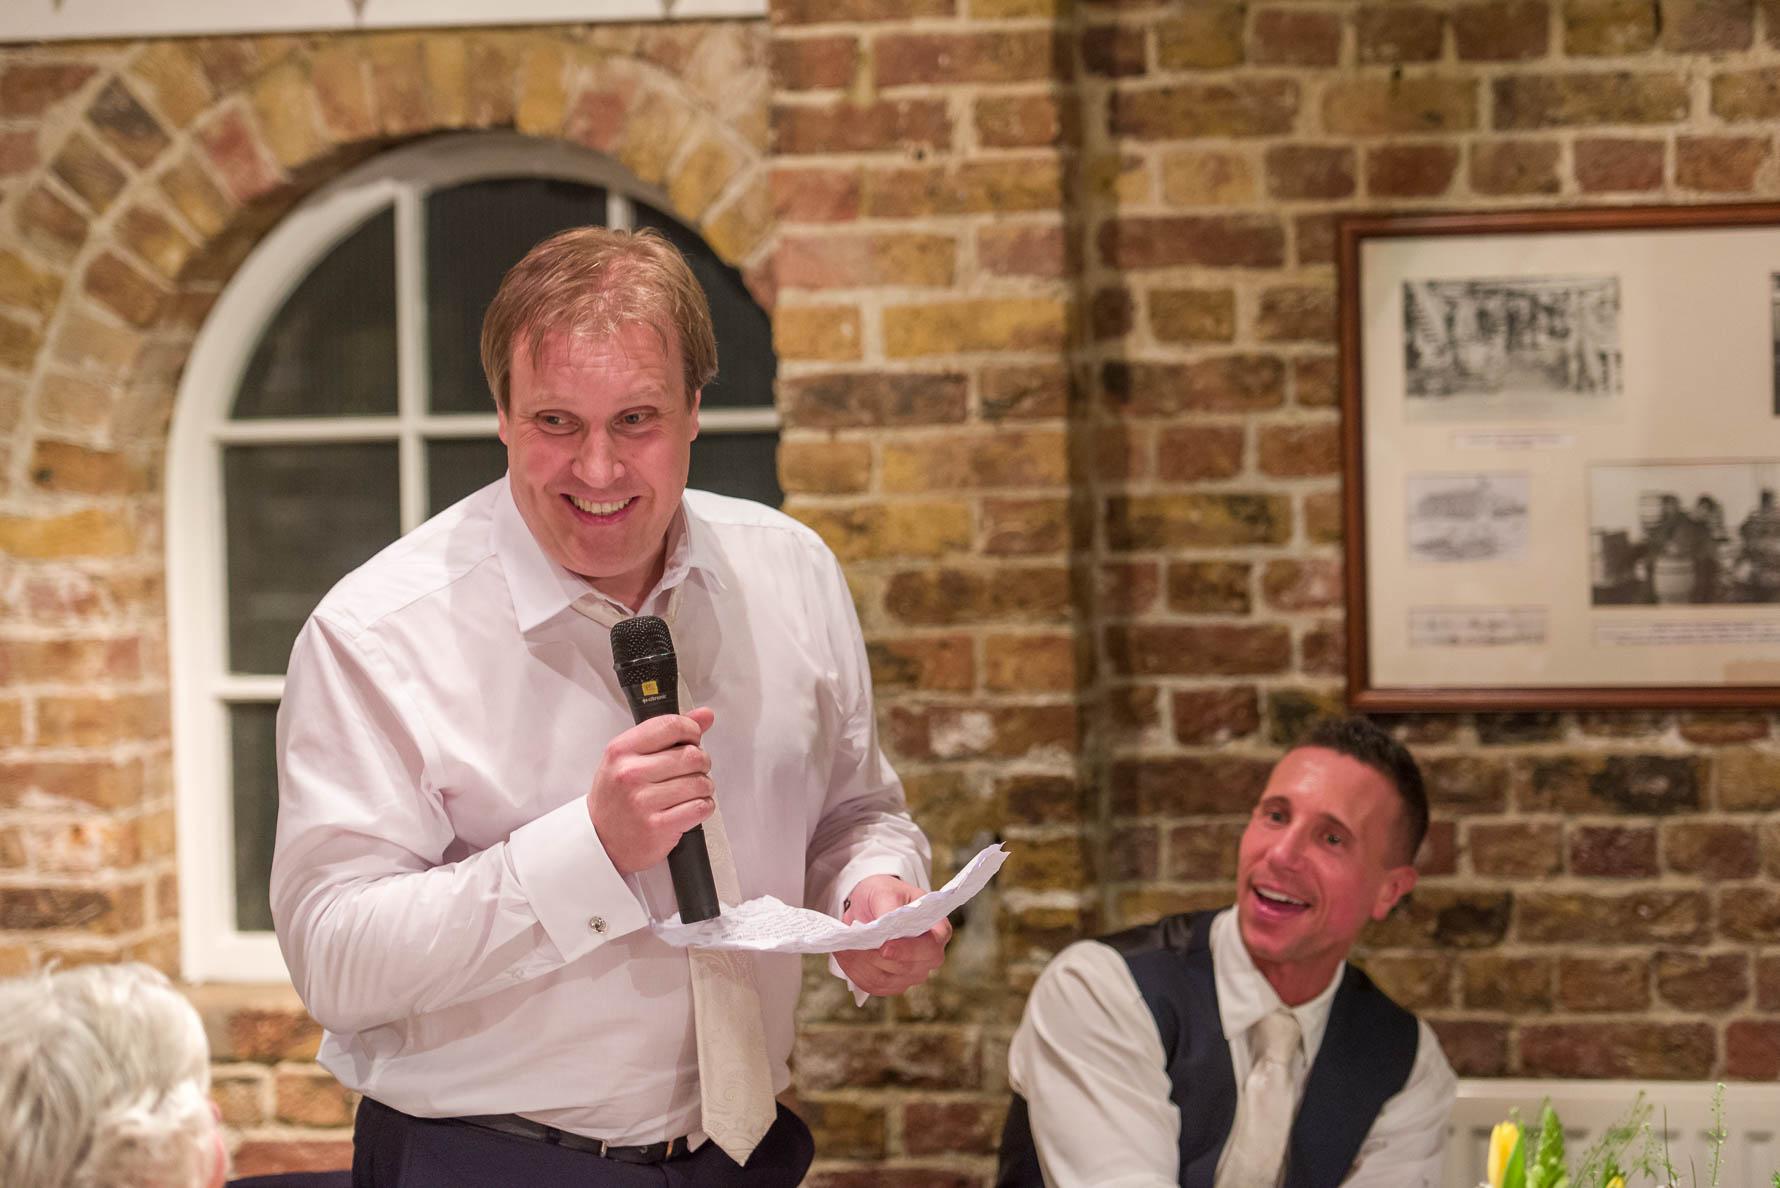 Wedding Photographer East Quay Venue-38.jpg